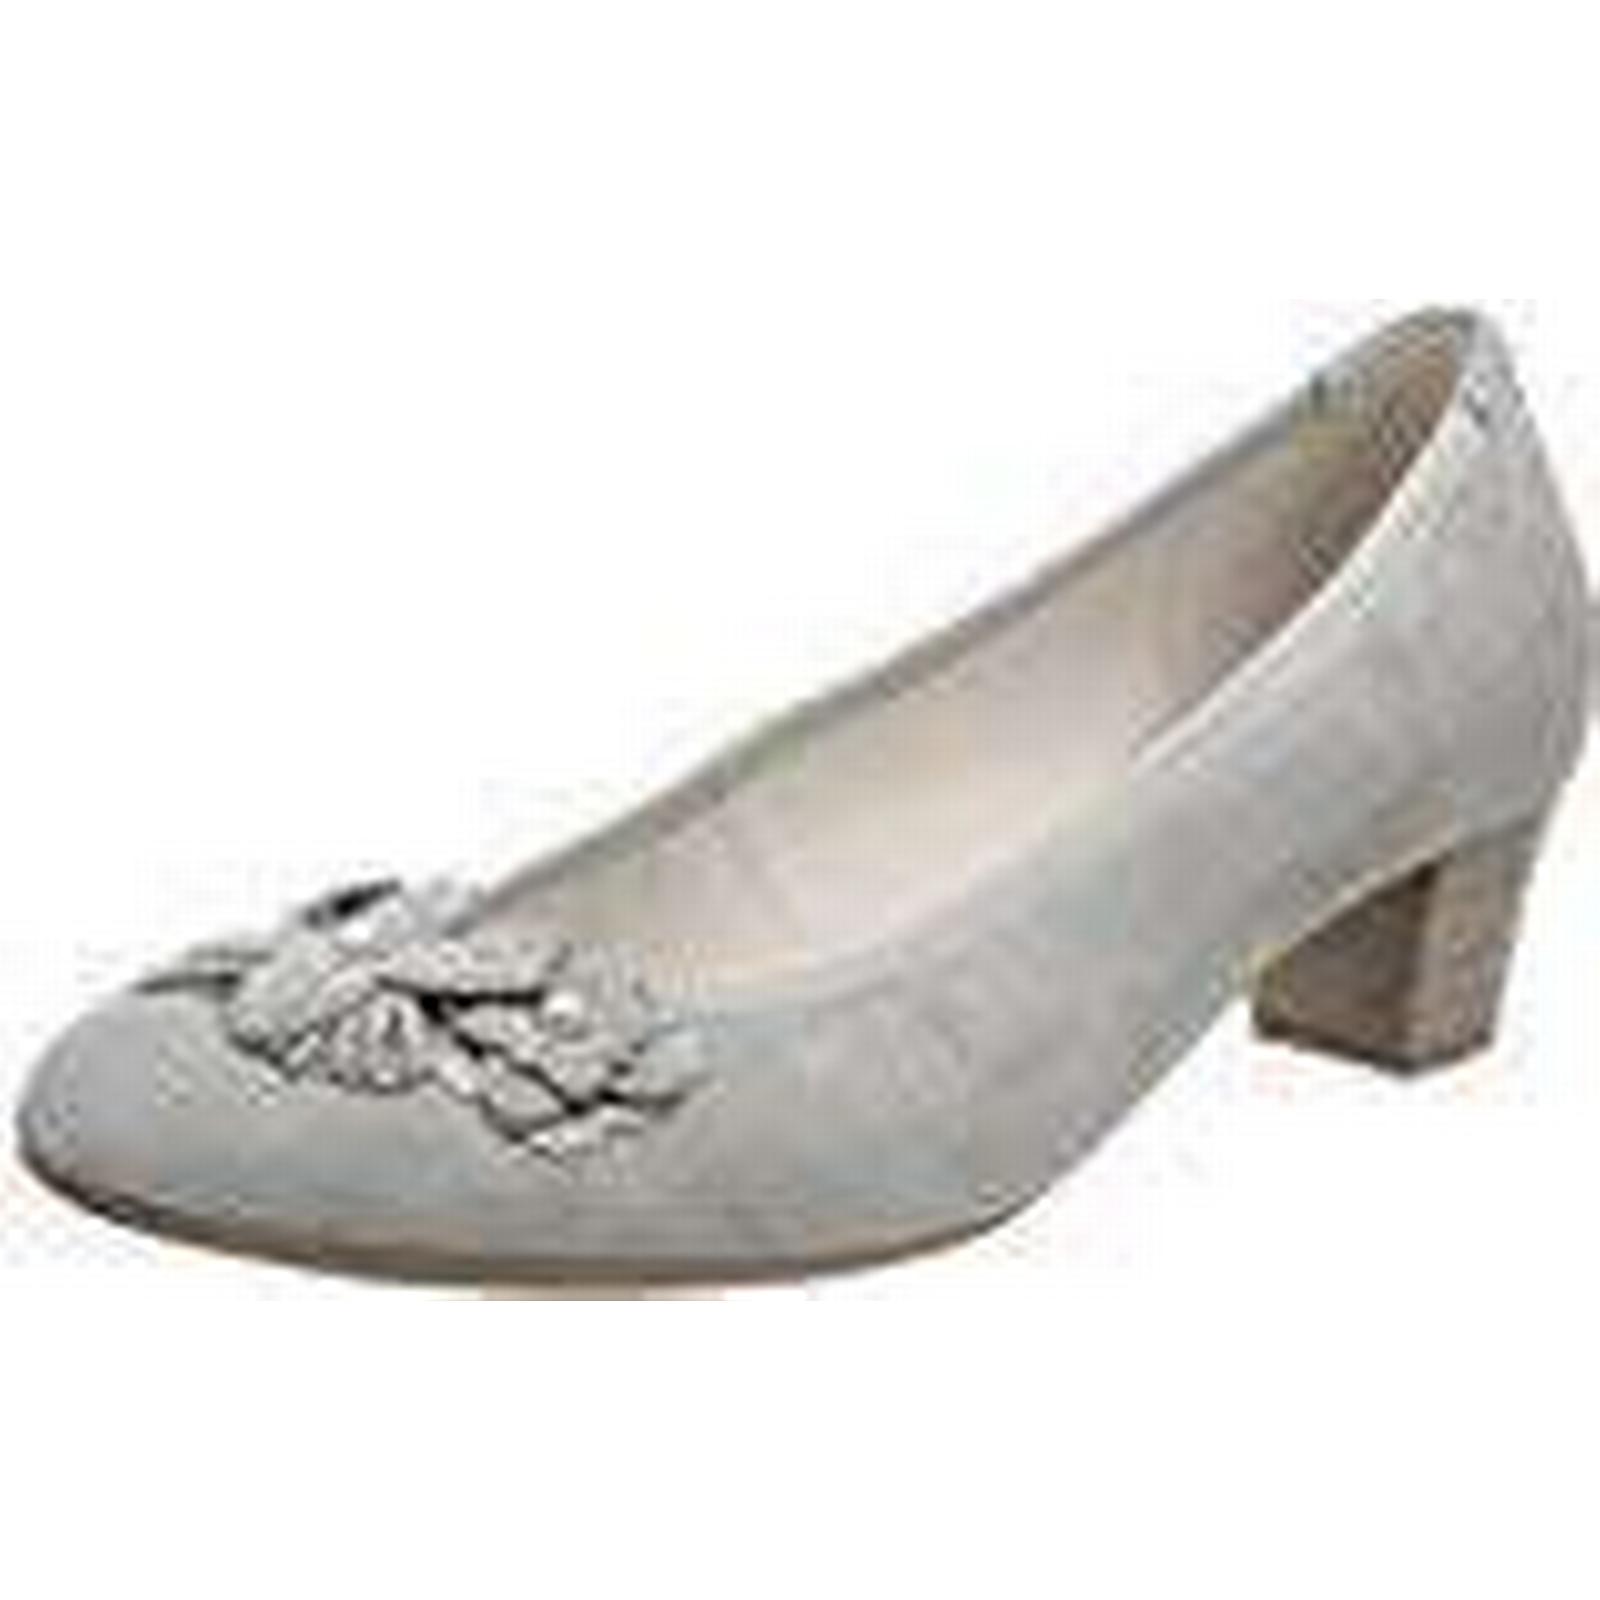 Gabor Shoes Grey Women's Basic Closed-Toe Pumps, Grey Shoes (Stone), 6.5 UK 81a156